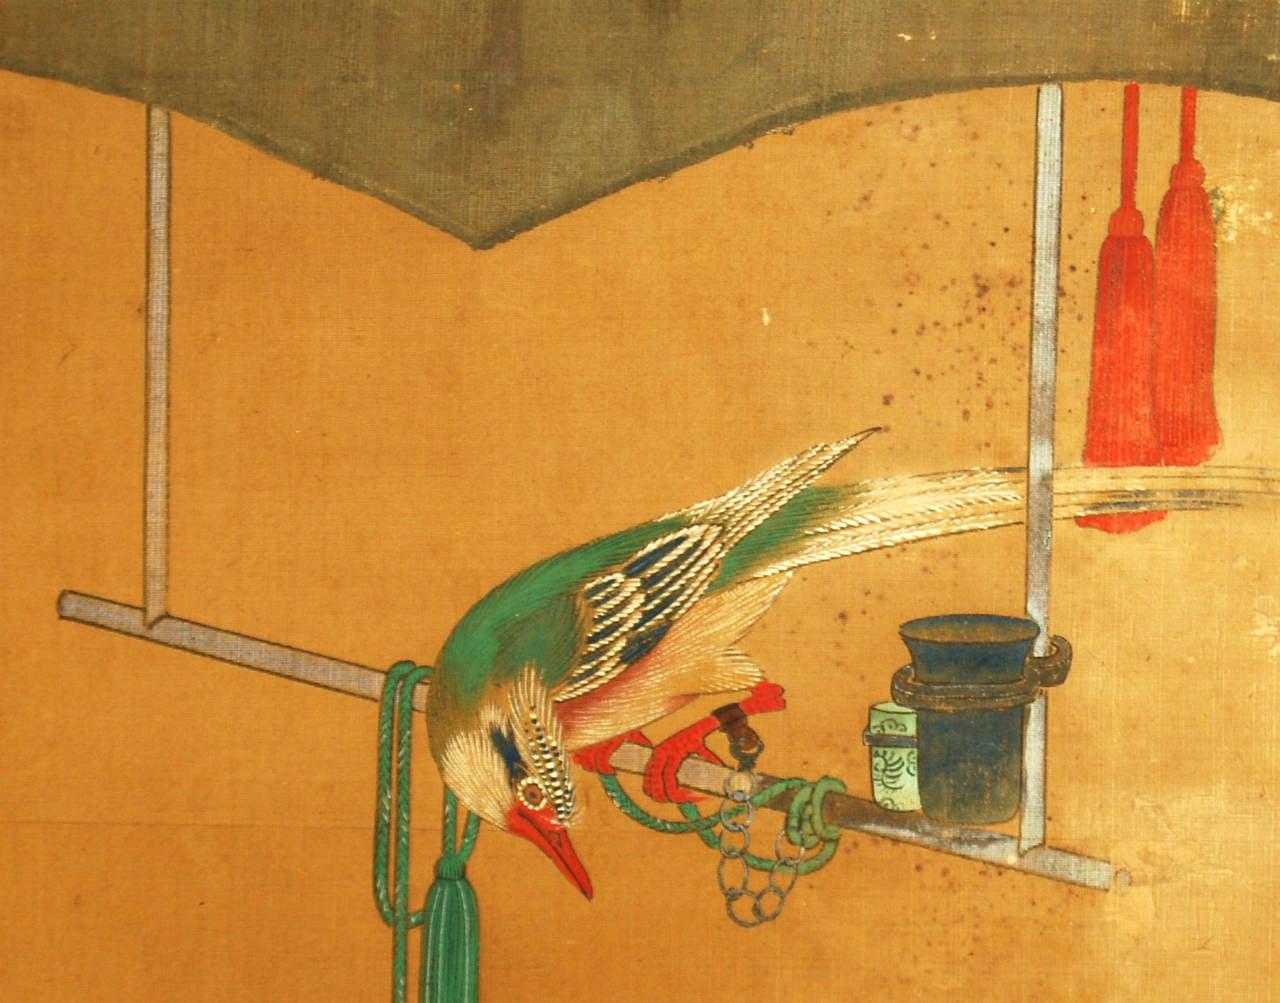 Antique Japanese two-panel screen from the Nagasaki School by Yanagisawa Kien (1704-1758).   Dimensions: W 182cm x H 63cm.  Kien was born at the residence of Kofu Domain during the Edo period. The domain lord of Kofu was Yanagisawa Yoshiyasu, a